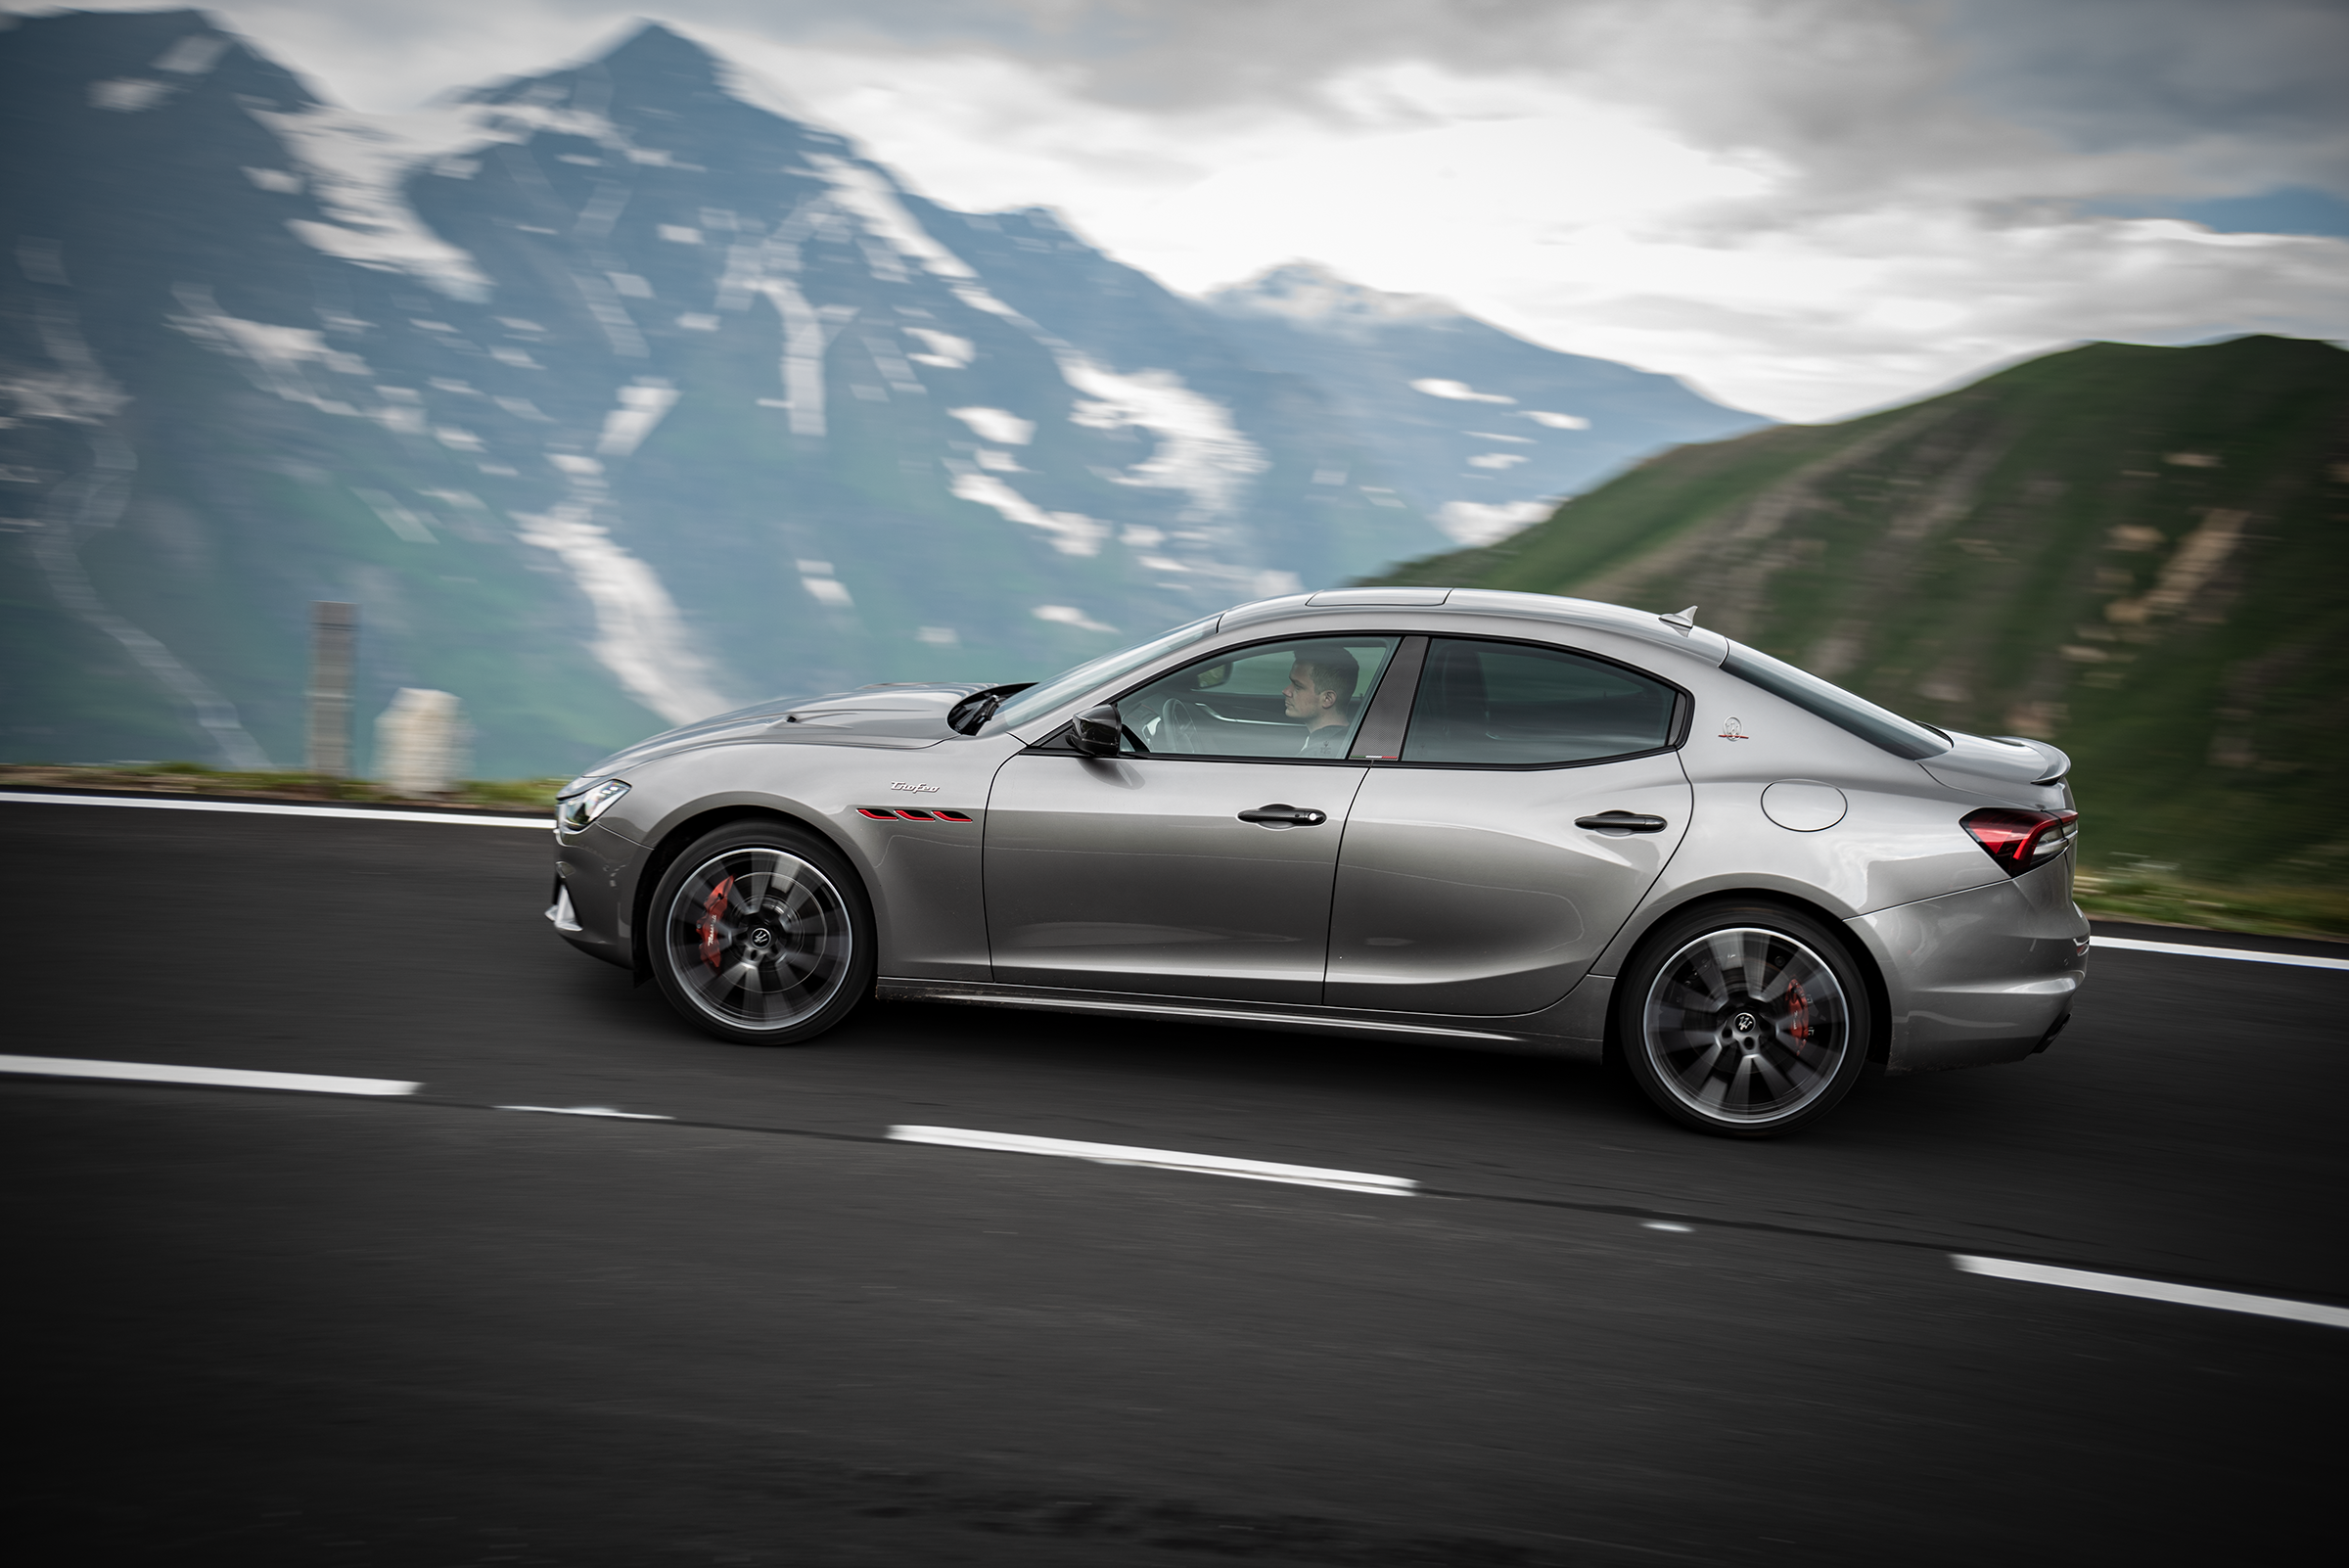 Maserati-Ghibli-Trofeo-V8-Dynamic